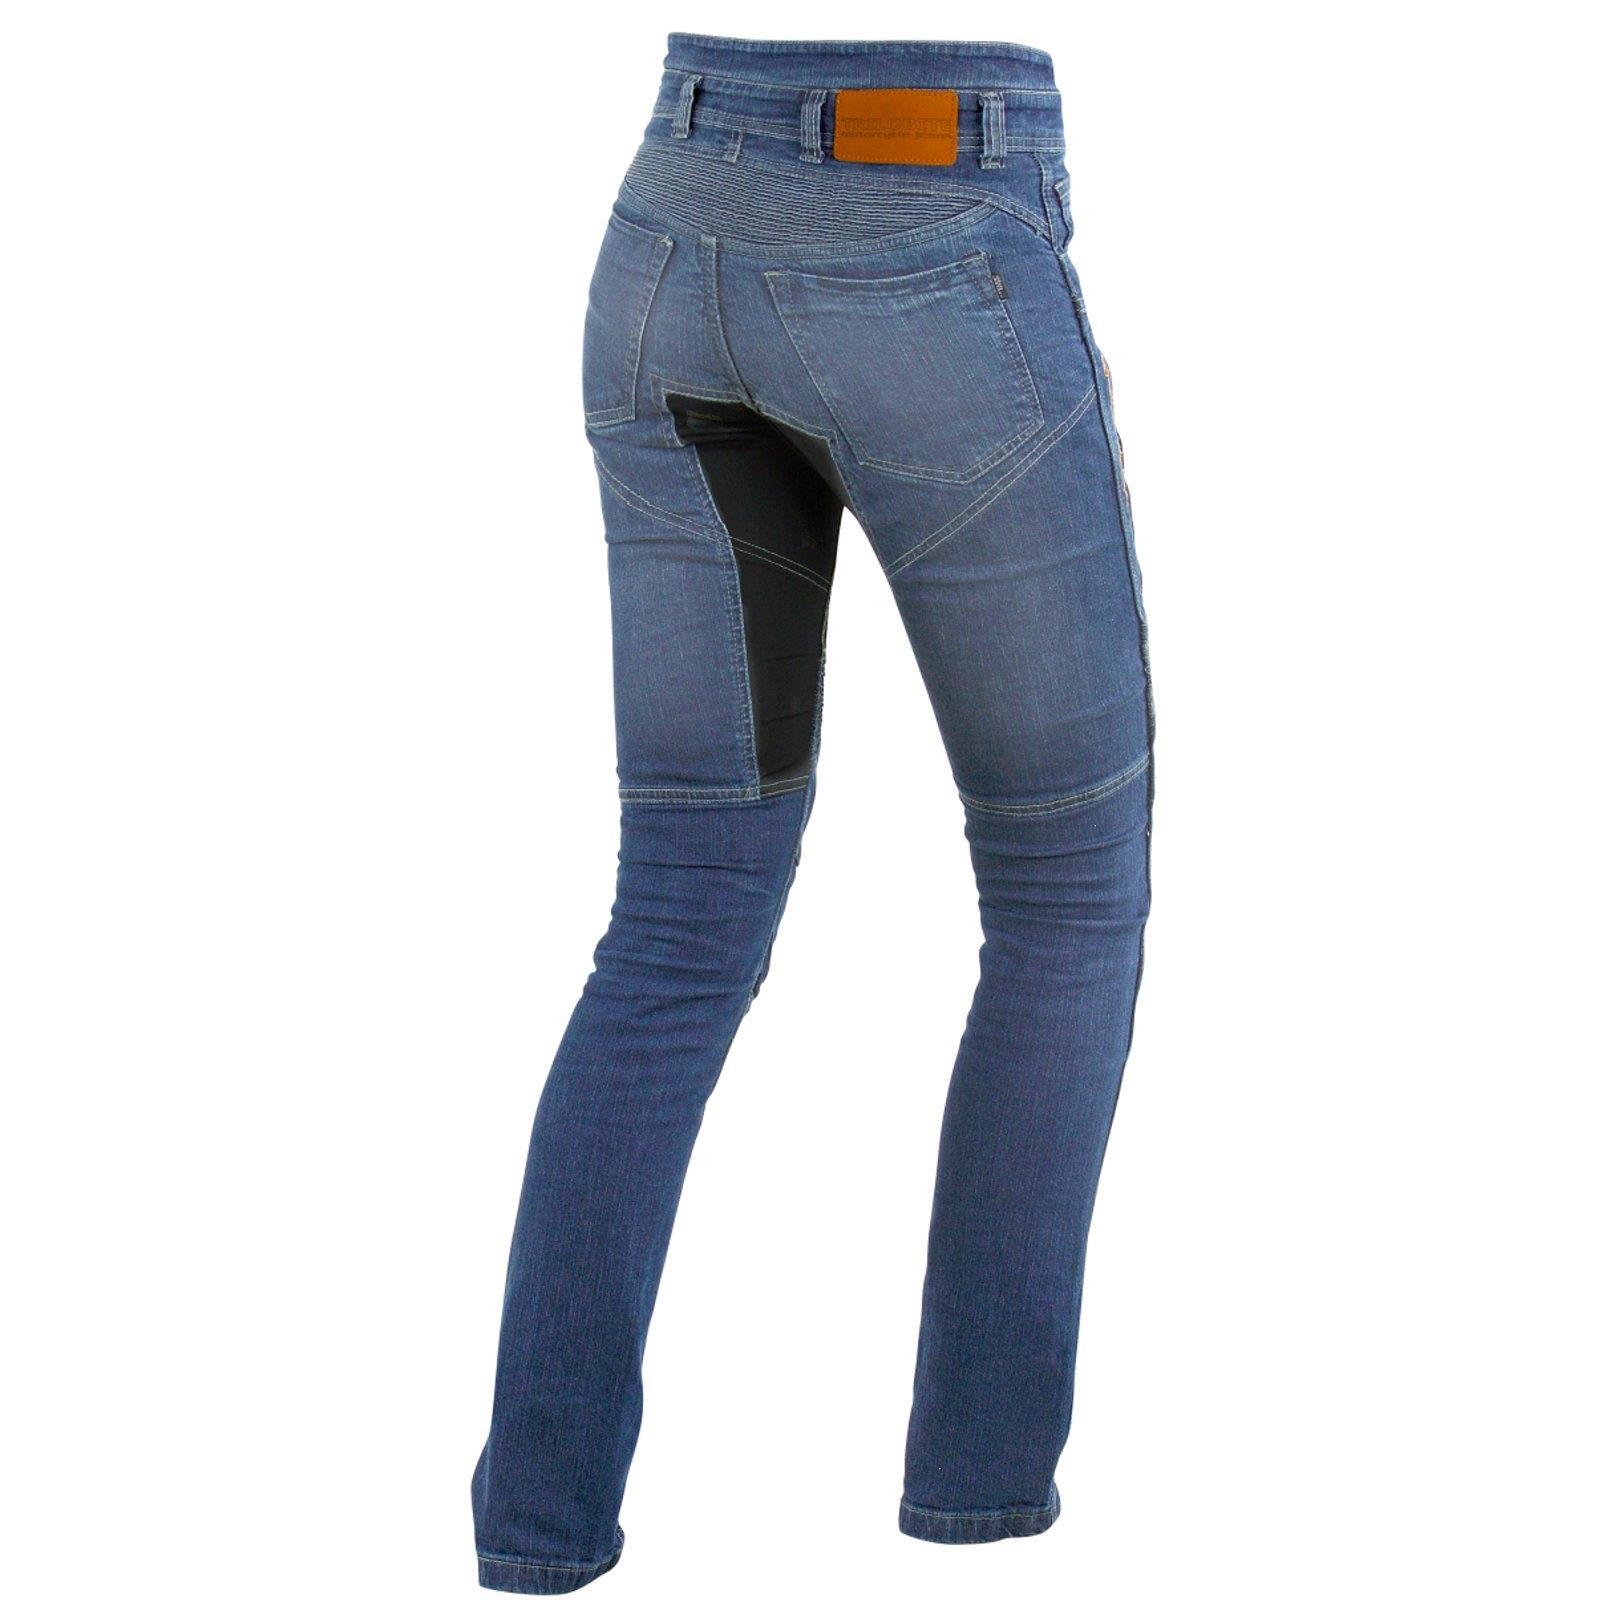 Trilobite-Pantaloni-Moto-Jeans-Abbigliamento-Parado-MICAS-URBAN-DUAL-PANTS-ACID miniatura 68